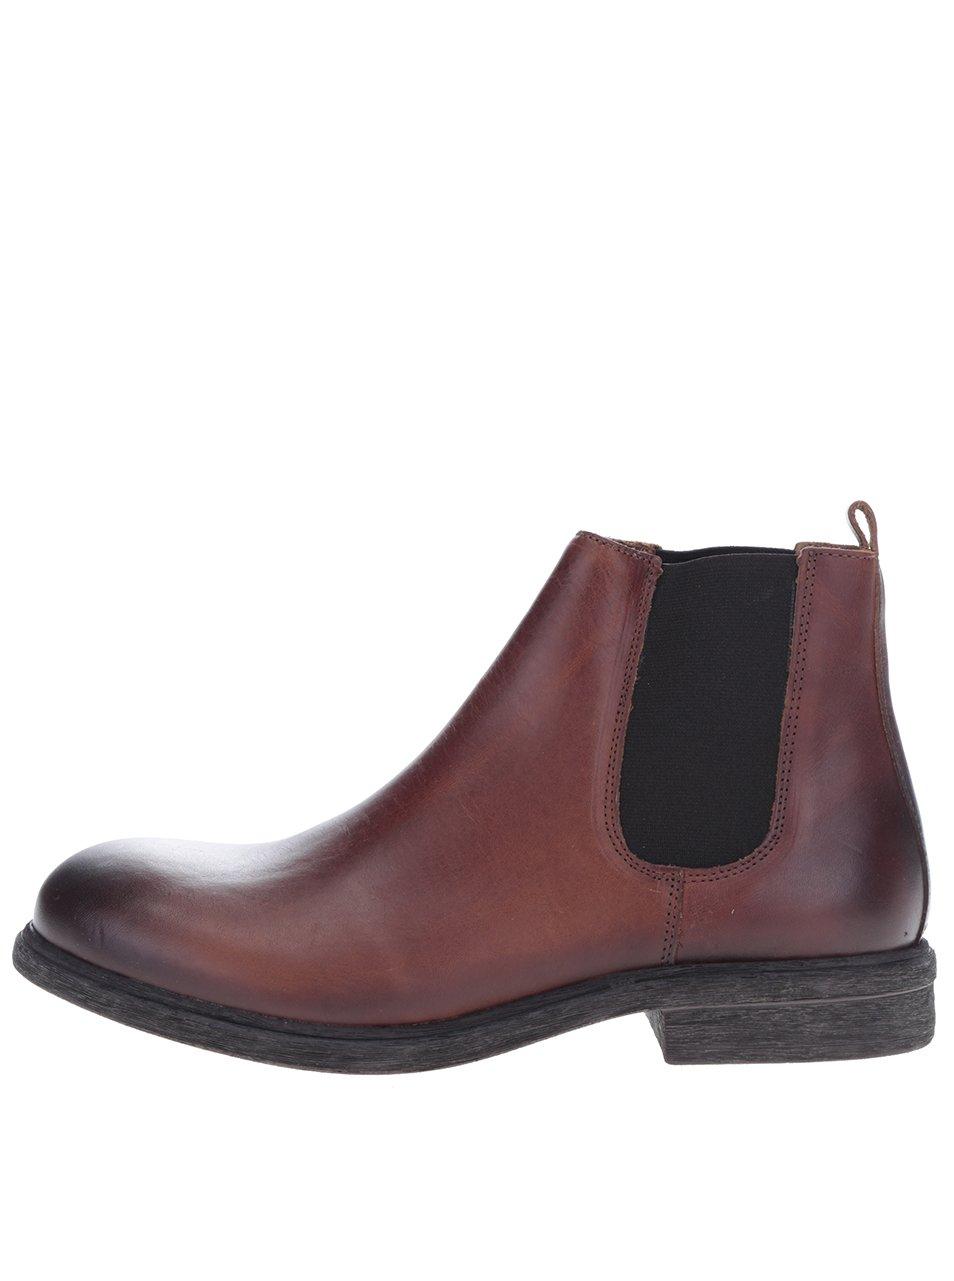 Hnědé kožené chelsea boty Selected Homme Trevor